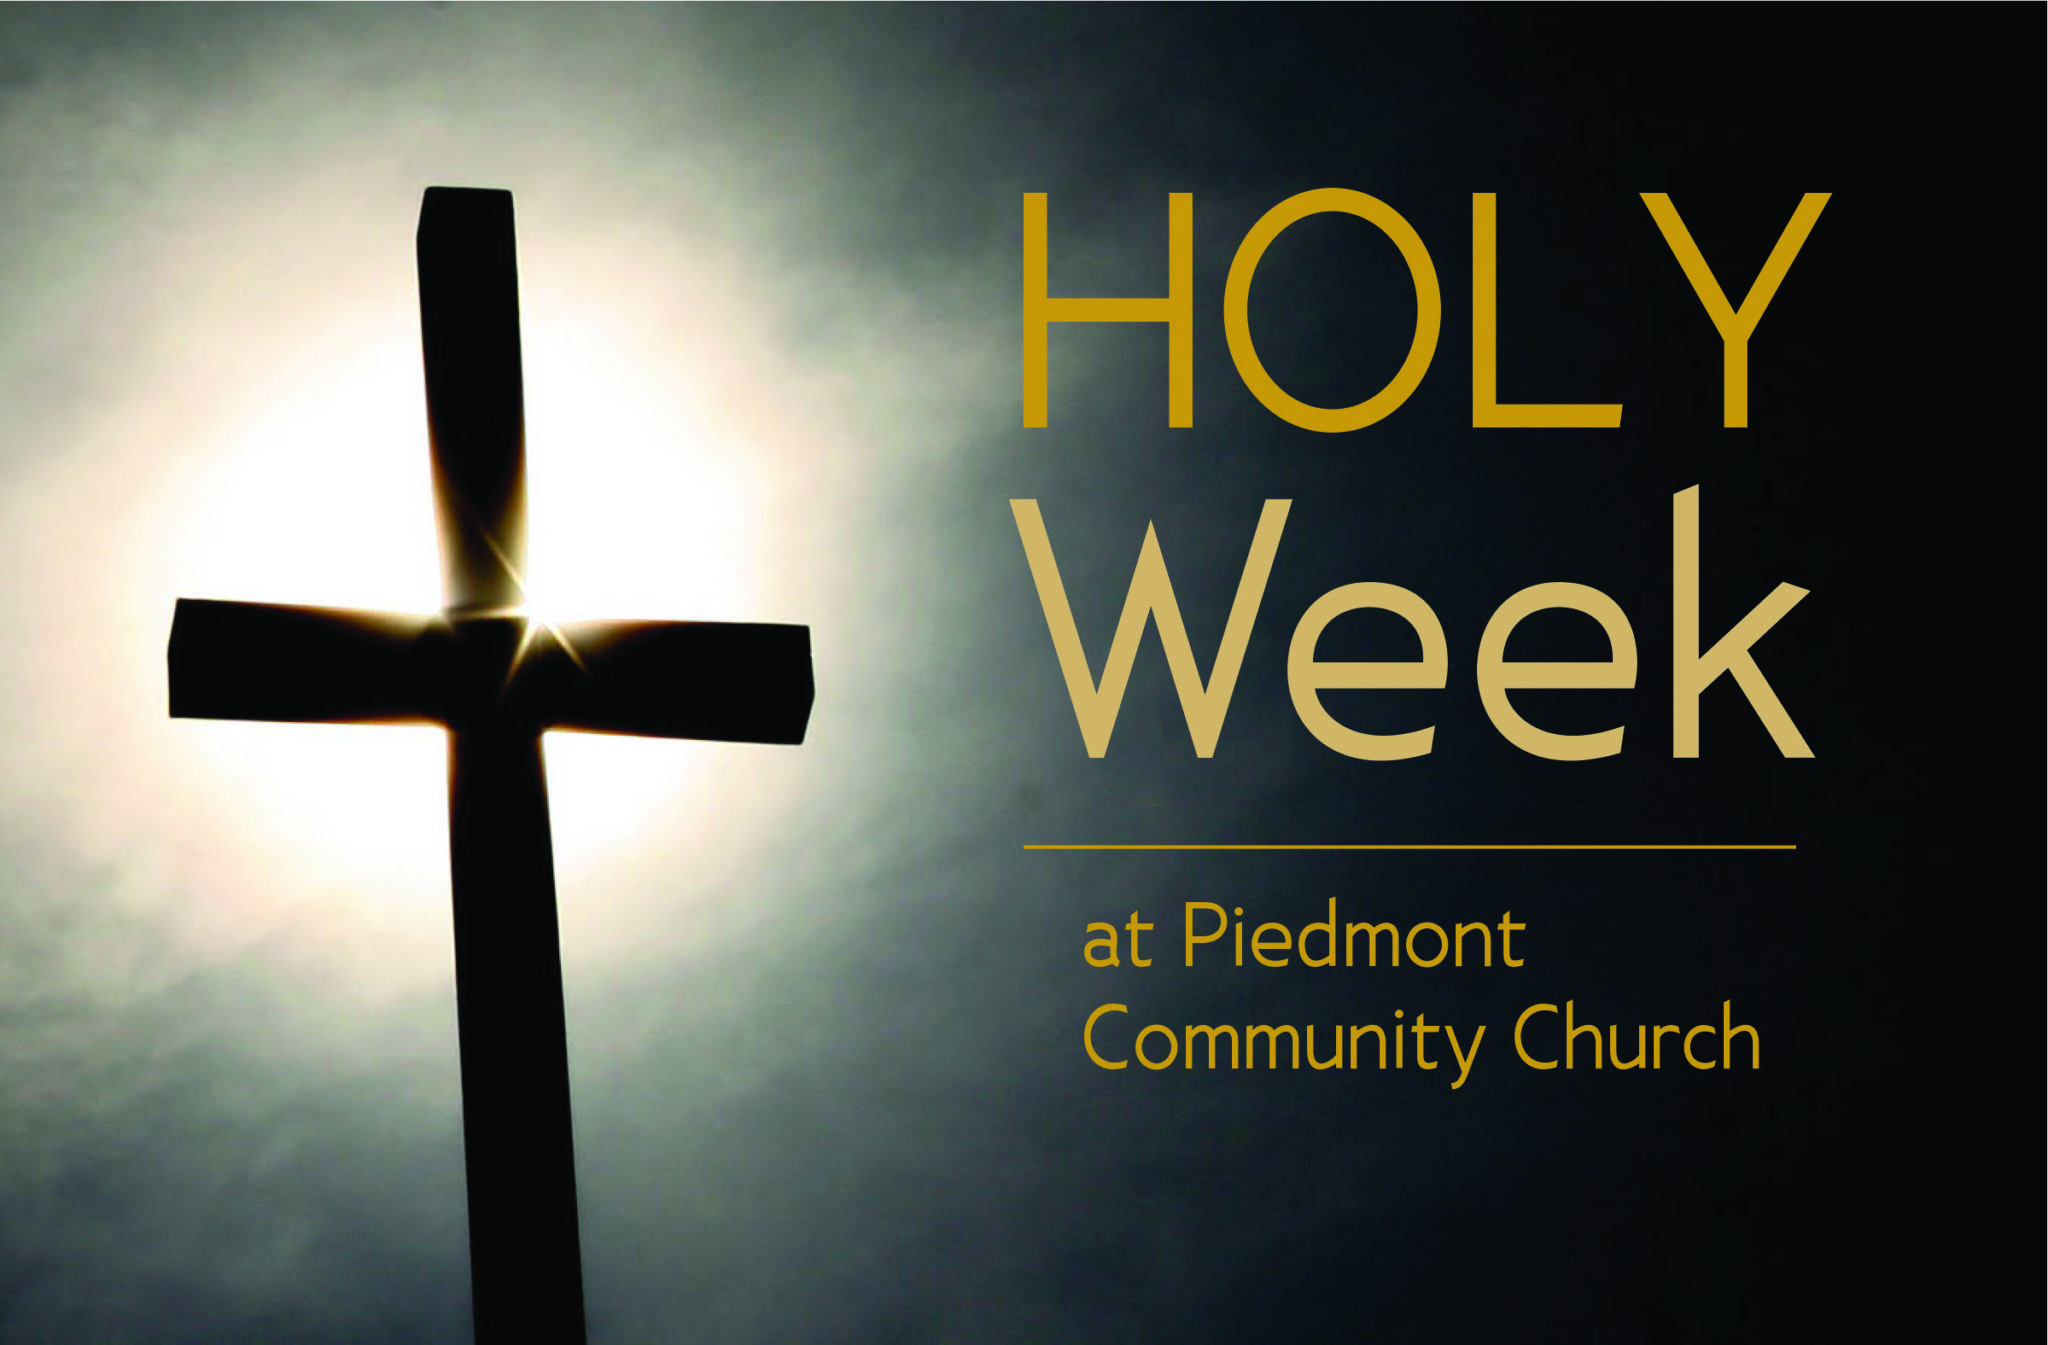 Piedmont Community Church